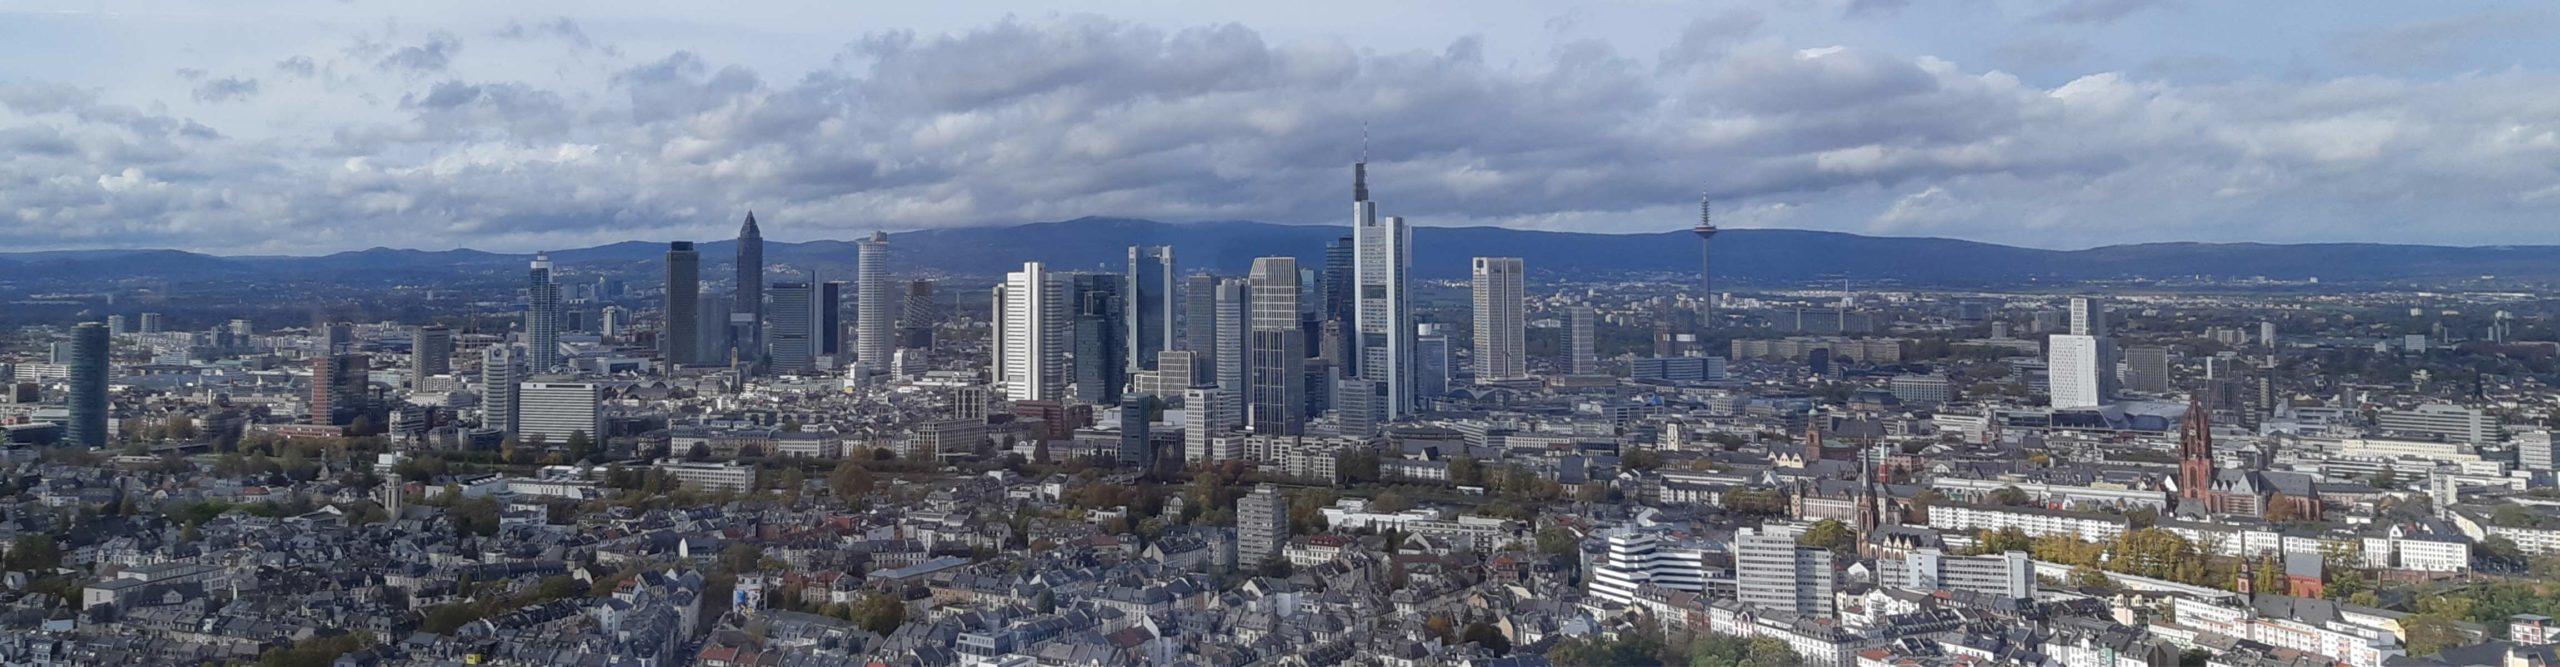 Panorama Frankfurt - Skyline Frankfurt 2019 - Stadtpanorama Frankfurt am Main - Blick vom Henninger Turm